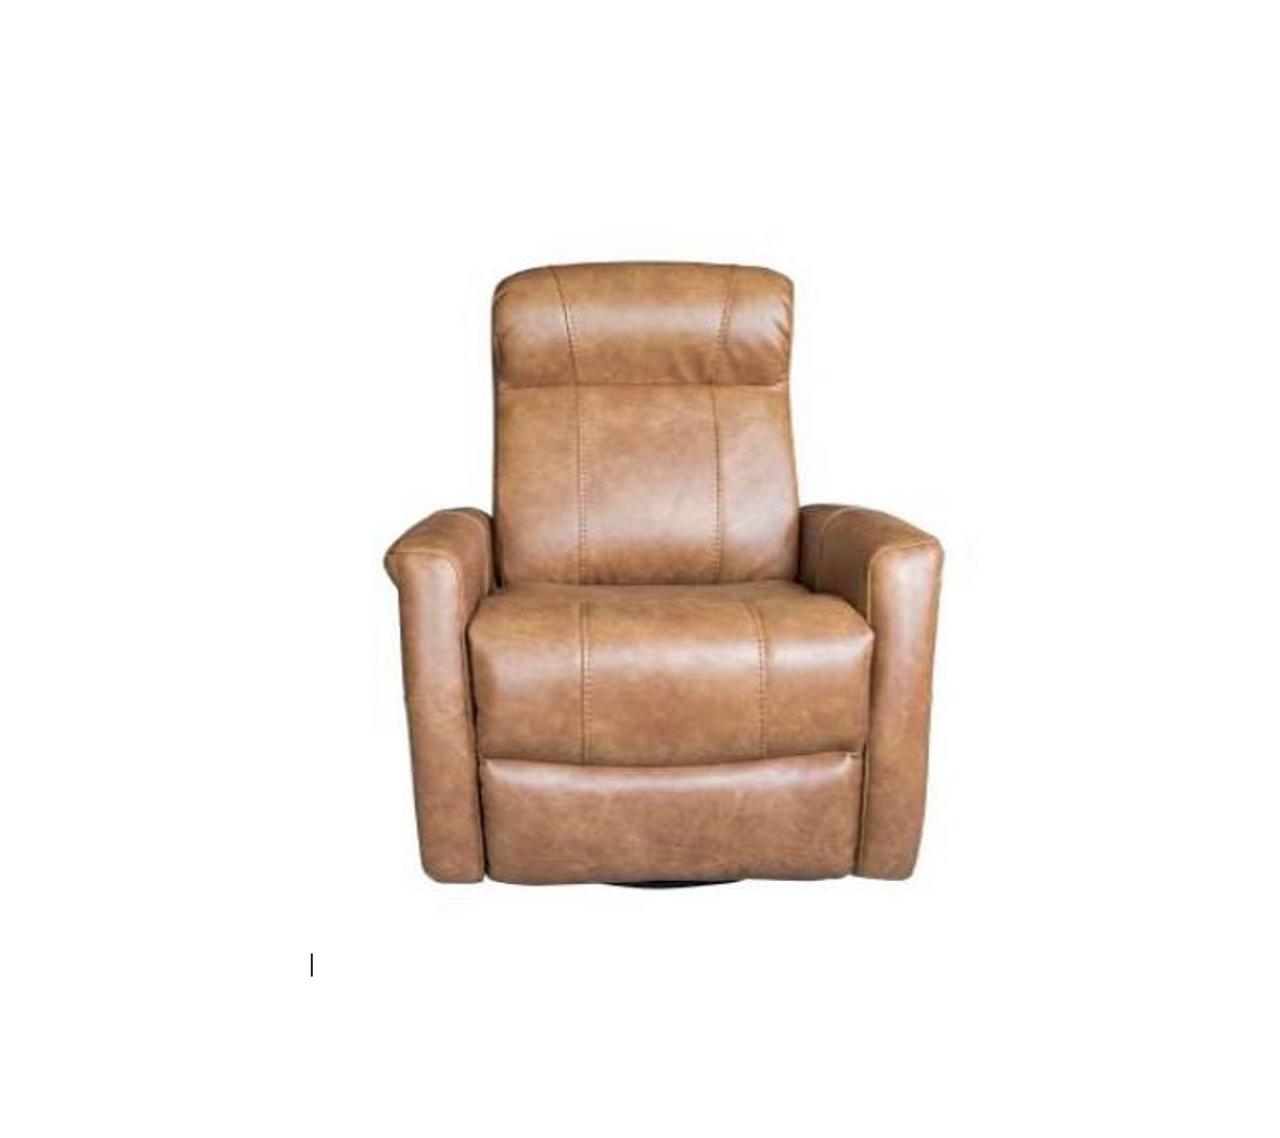 Surprising Atlas Electric Leather Recliner Chair Tan Australias Pabps2019 Chair Design Images Pabps2019Com